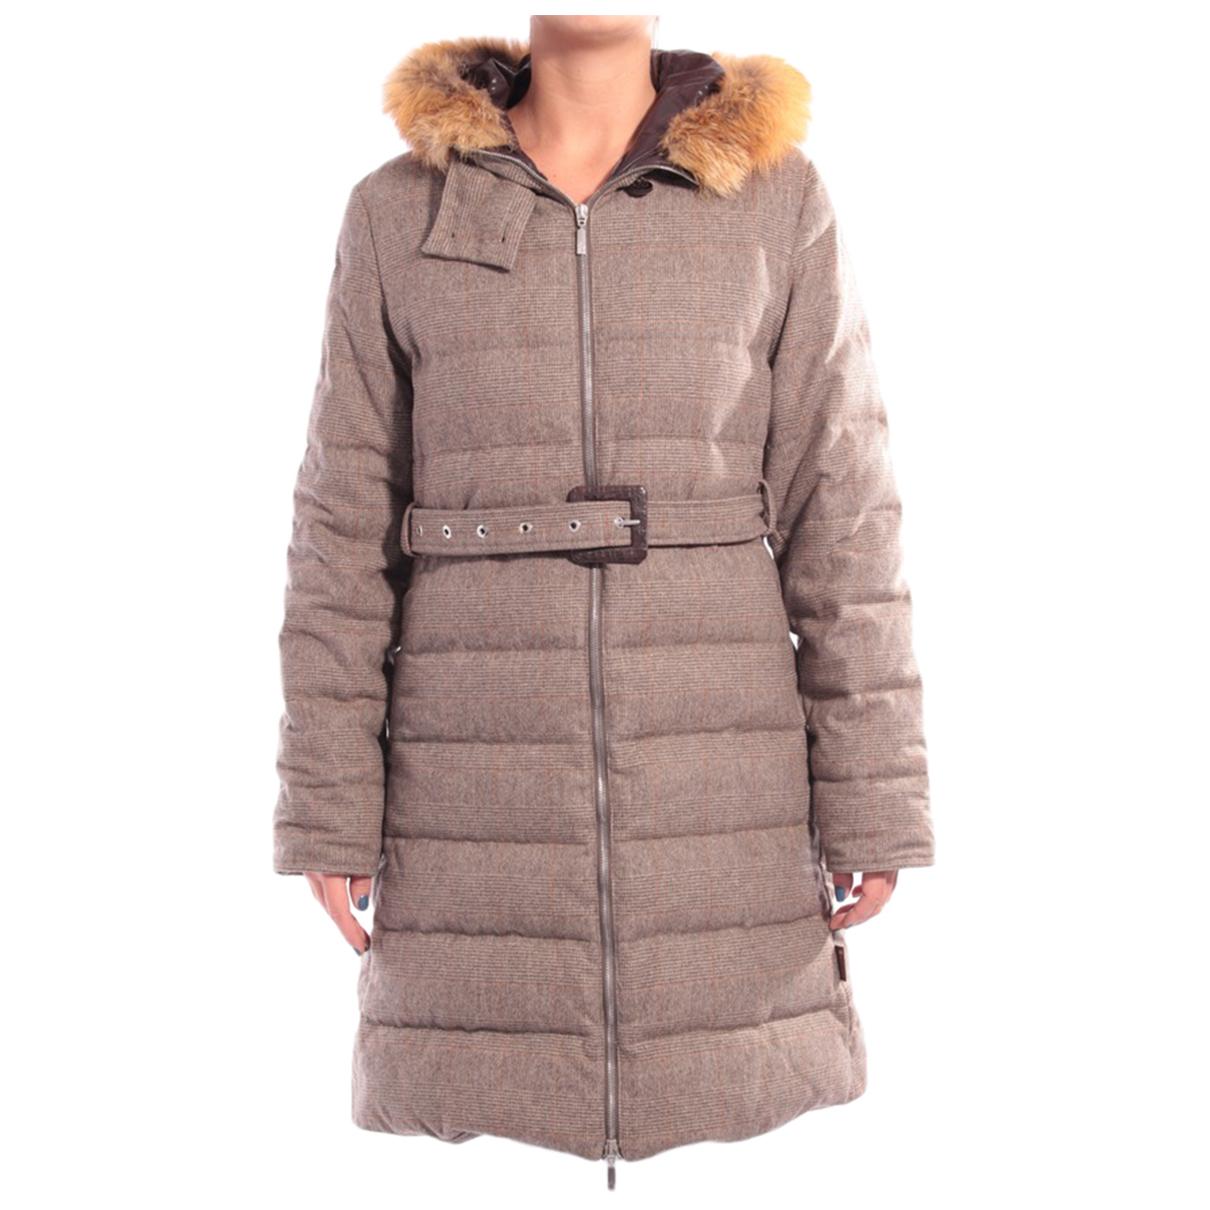 Moncler \N Beige Wool jacket for Women 36 FR